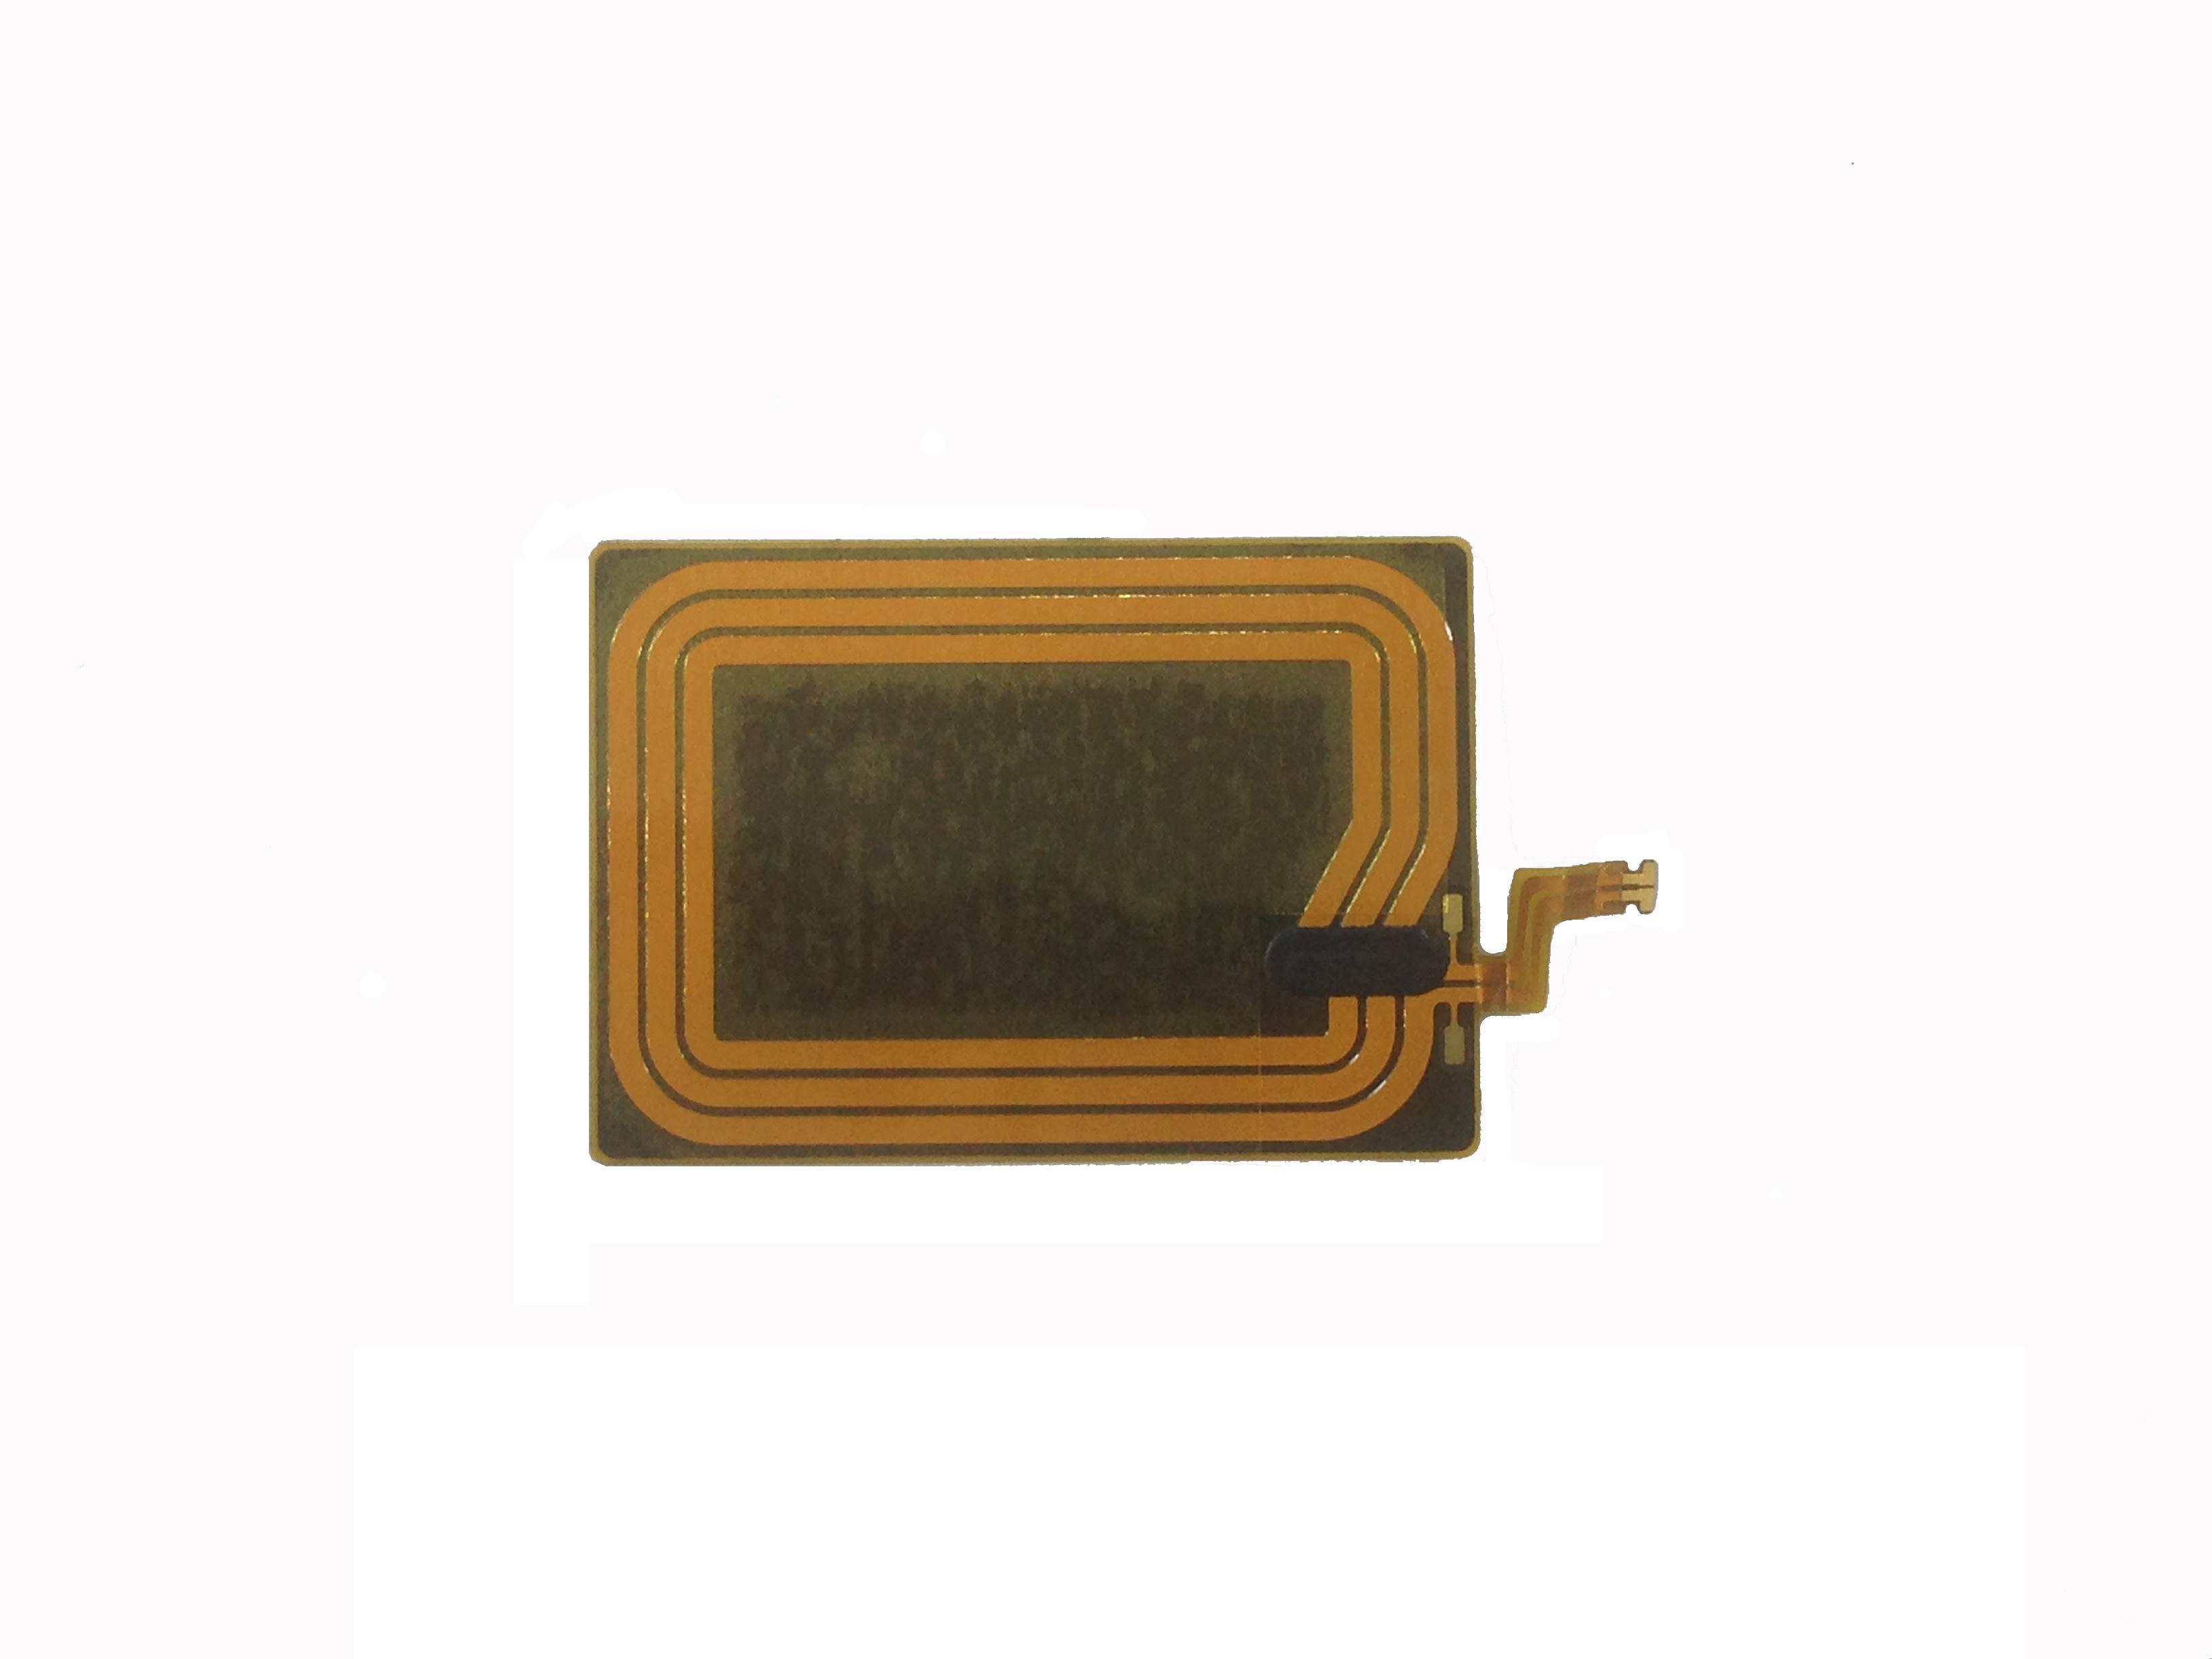 New 3DS NFC WIFI Board